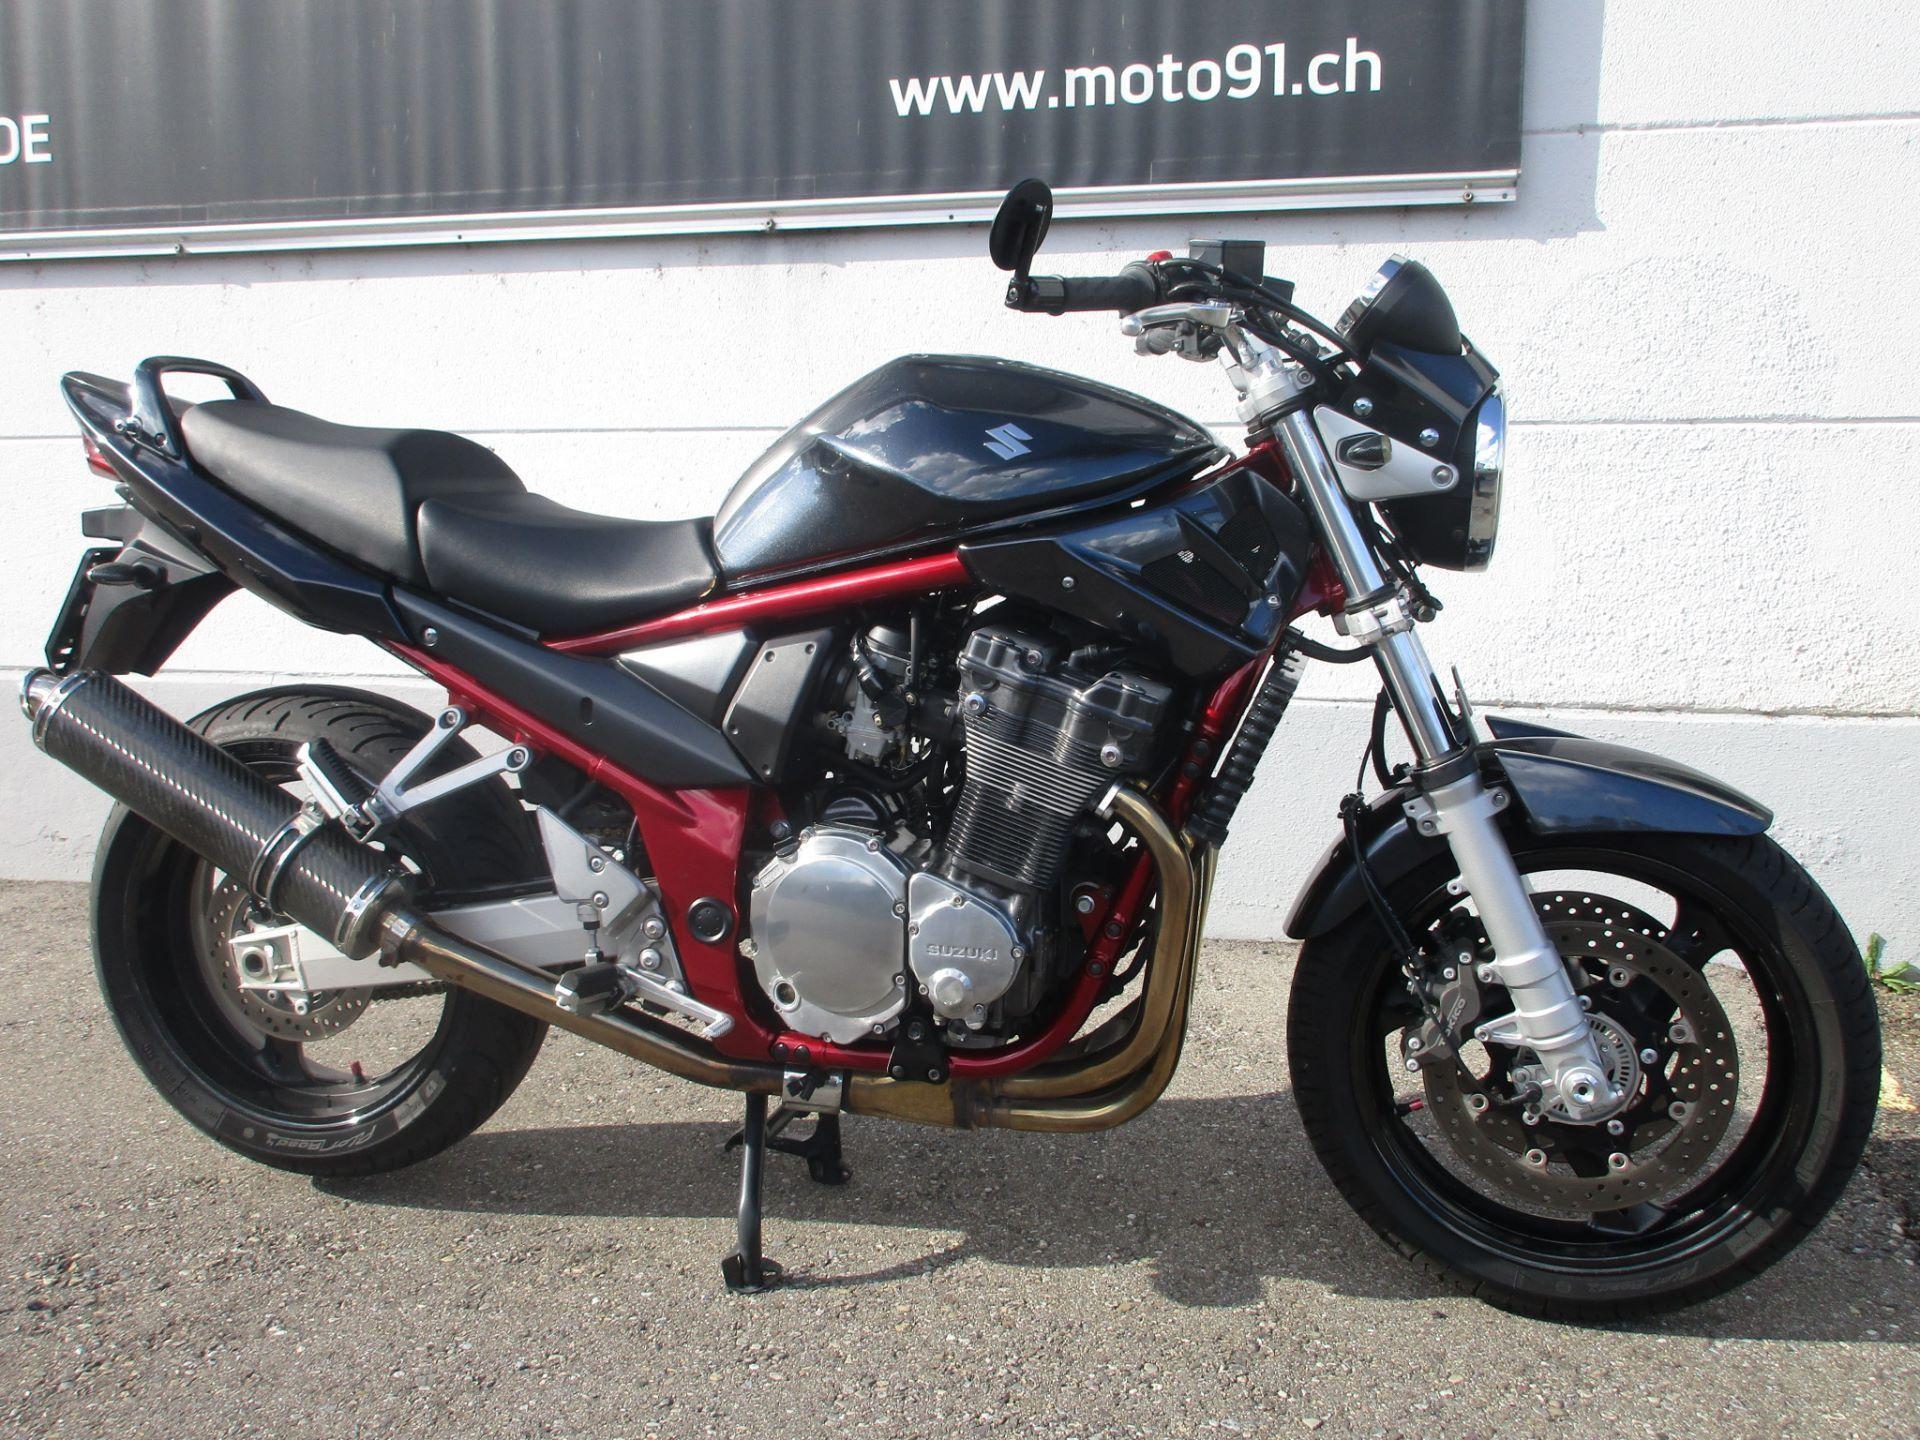 motorrad occasion kaufen suzuki gsf 1200 a bandit abs moto 91 ag h ri. Black Bedroom Furniture Sets. Home Design Ideas